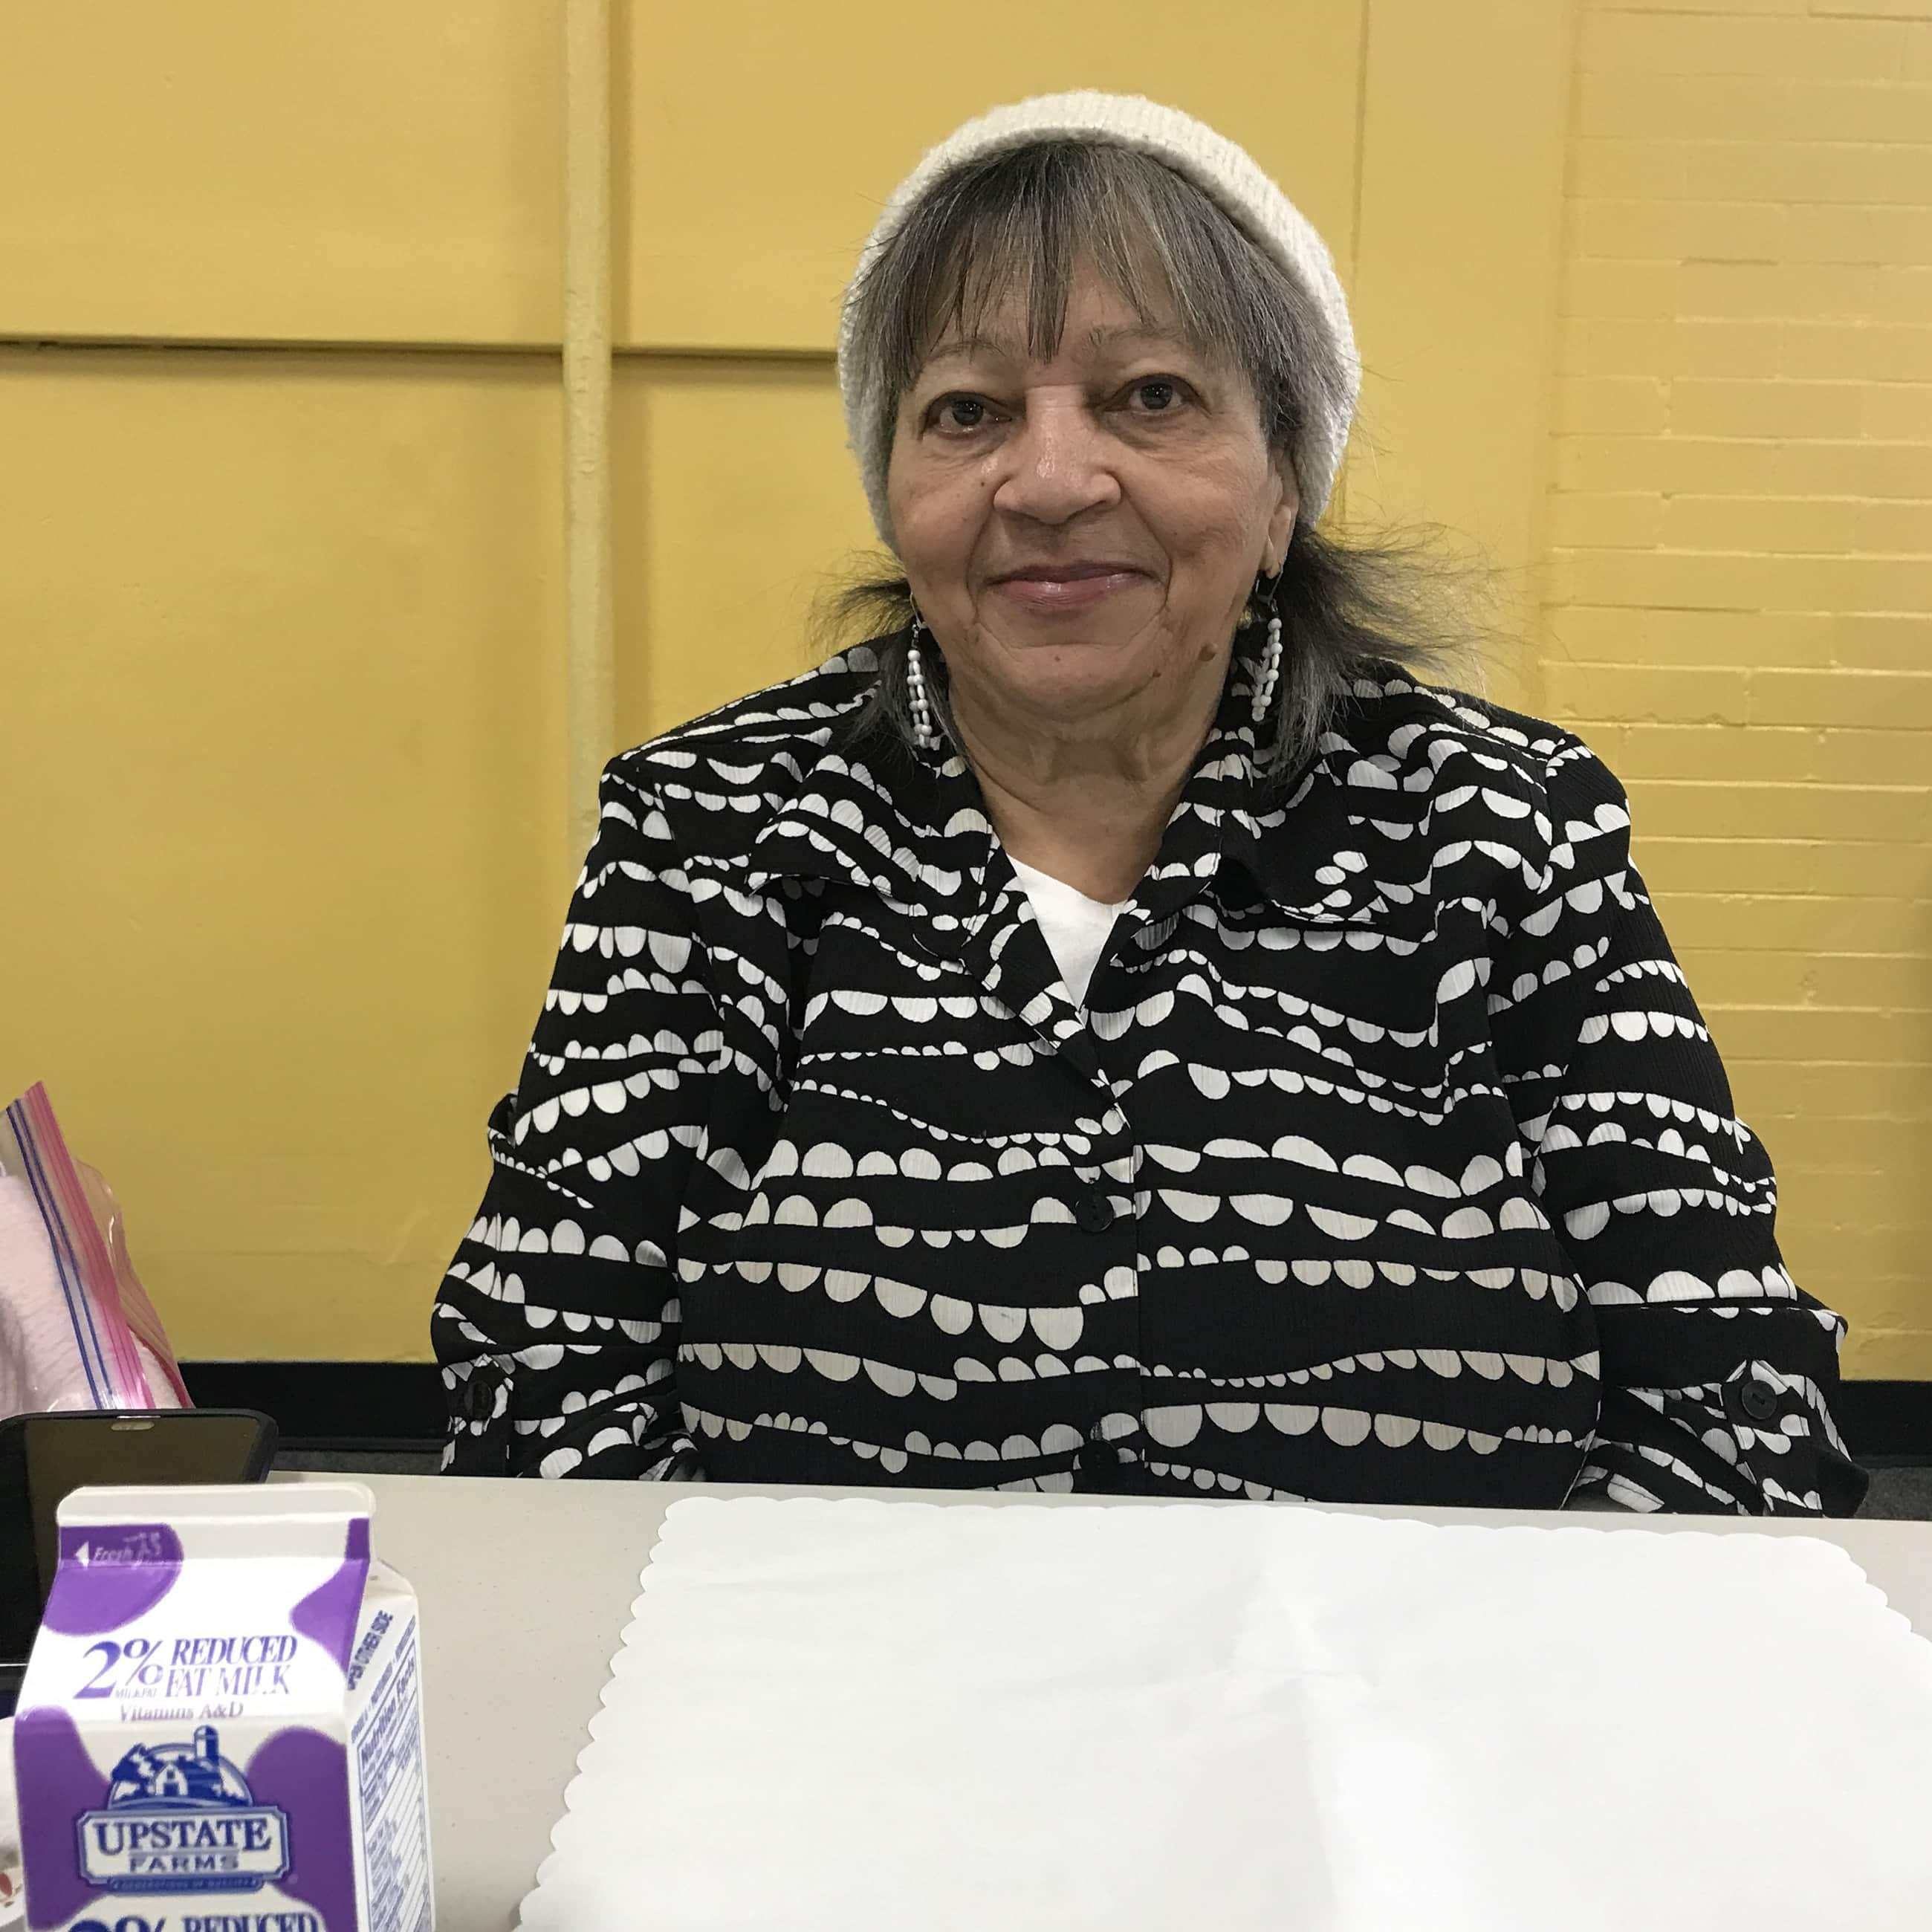 Olga Cepeda visits the Westcott Community Center in Syracuse, New York, for the Senior Nutrition Program.